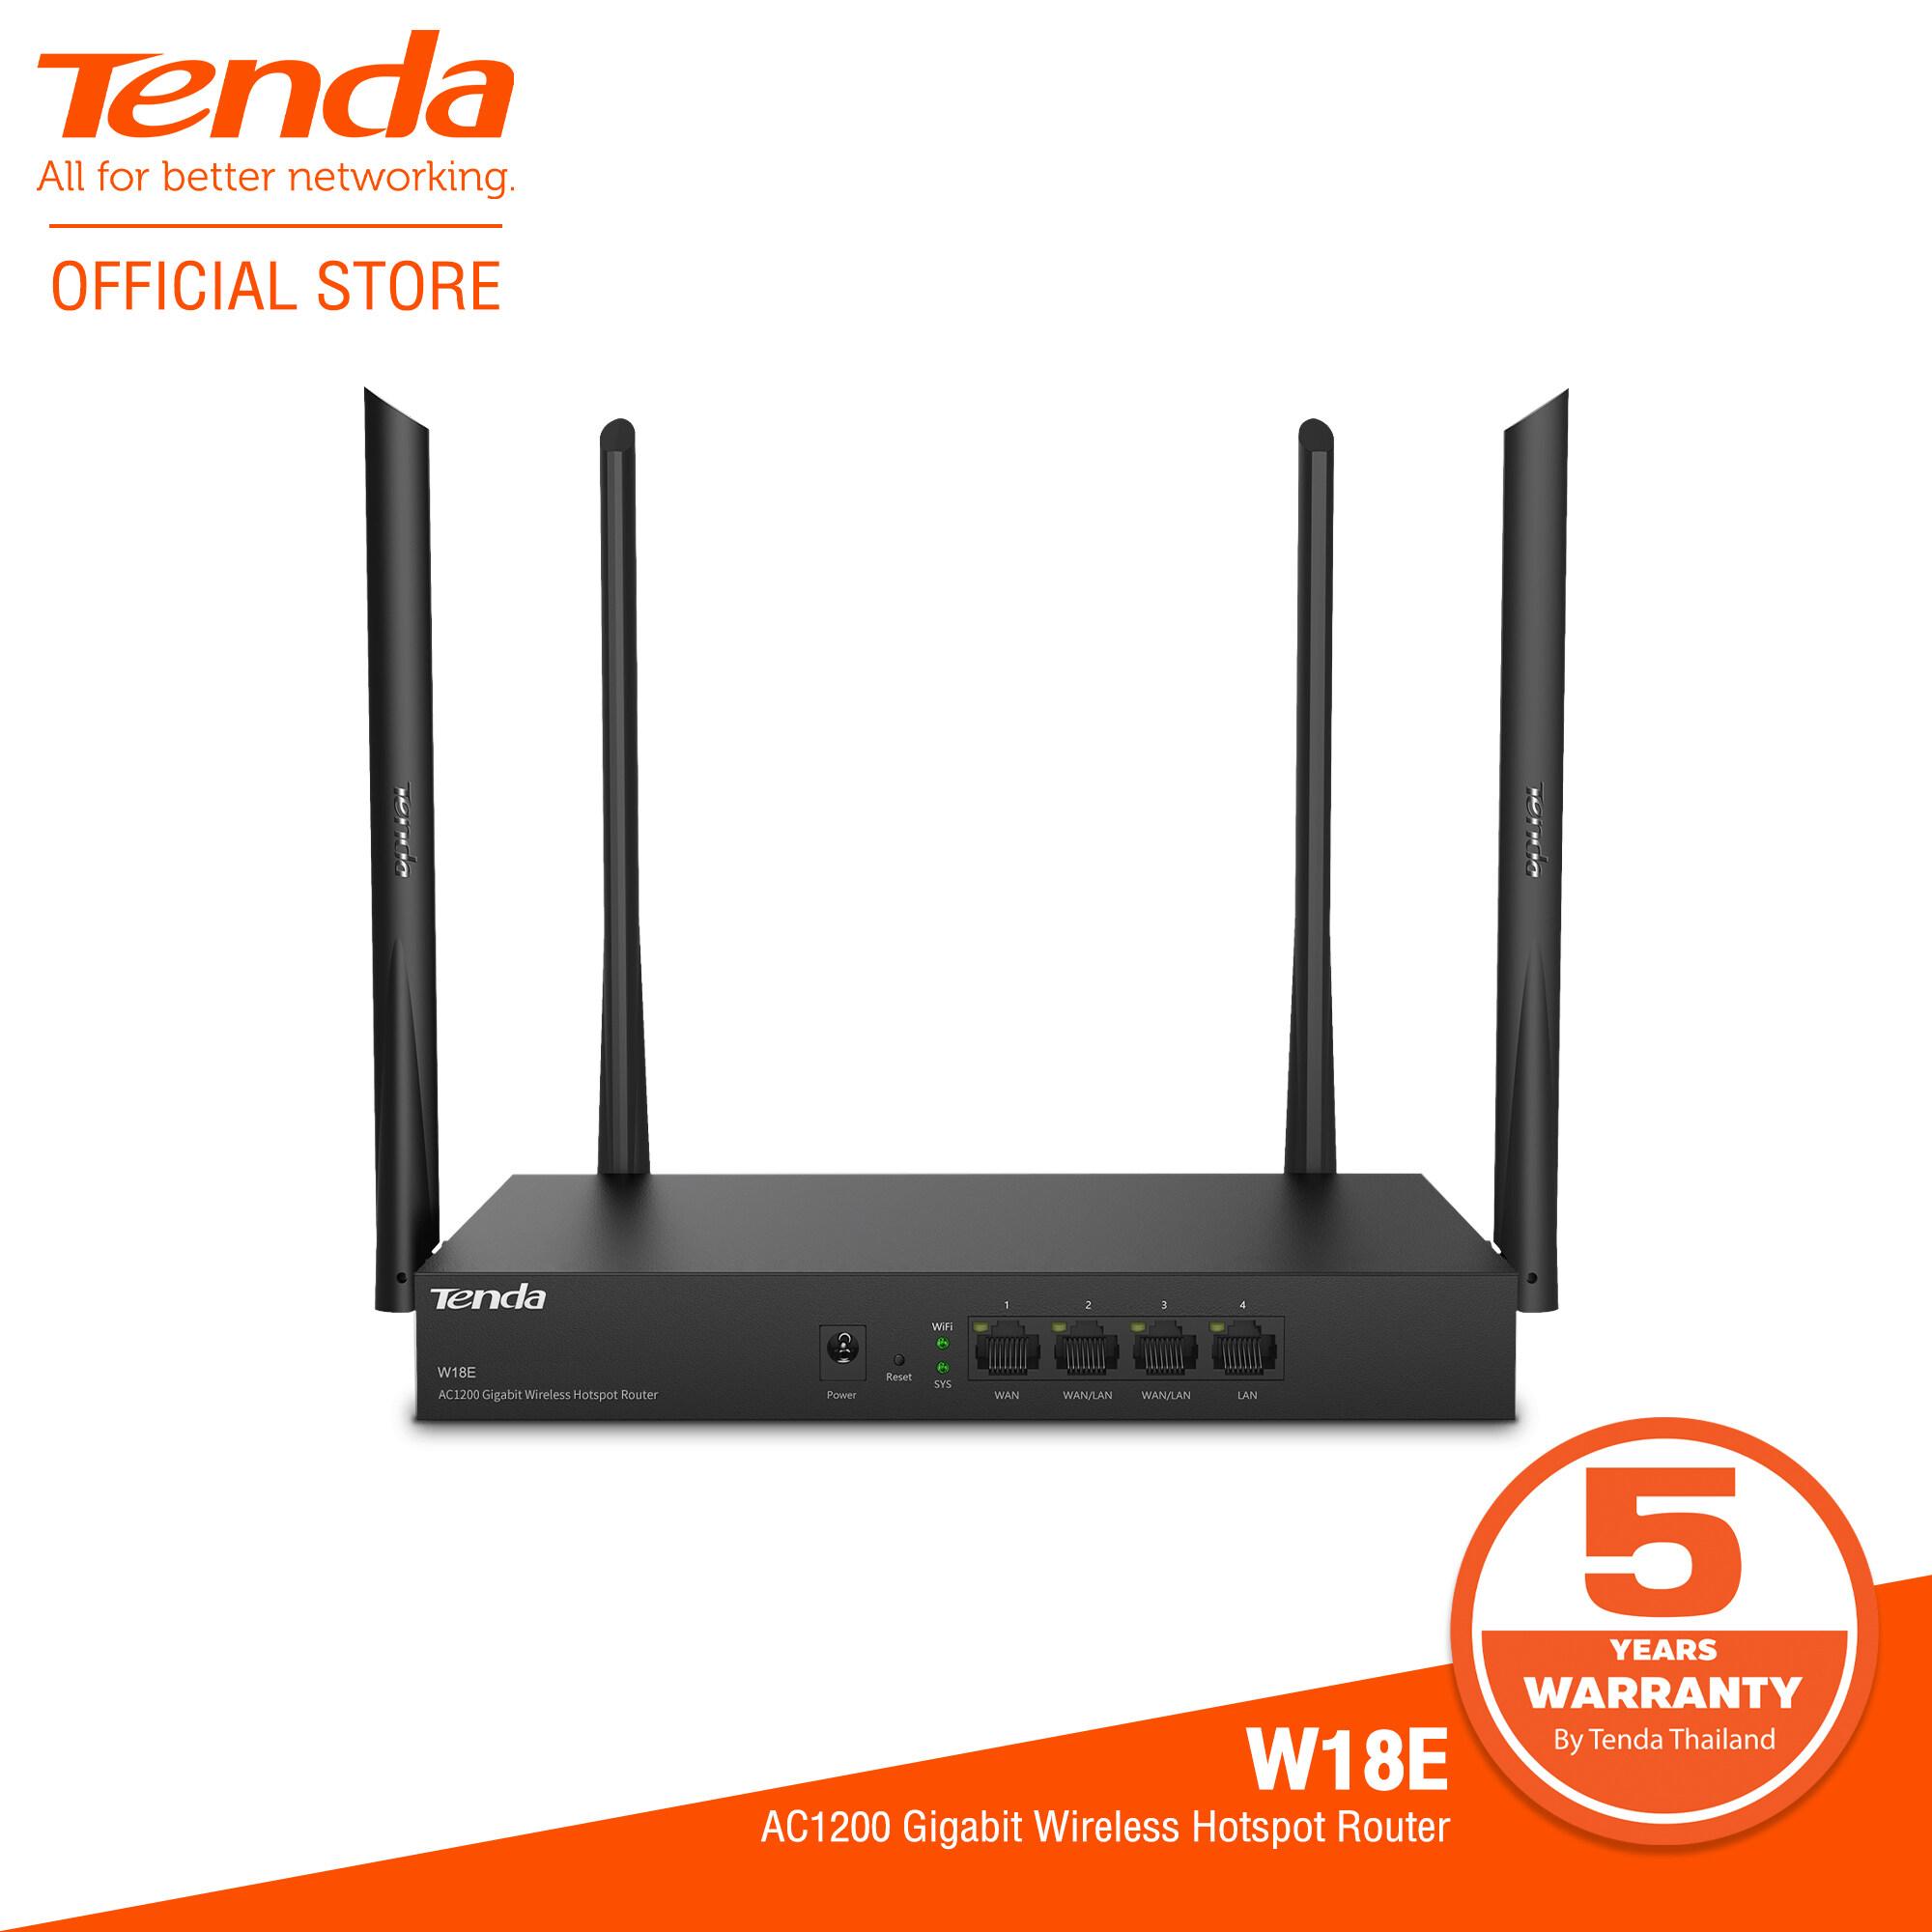 Tenda W18e Ac1200 Gigaport Wireless Hotspot Router เราเตอร์ / Wireless / Qos Vpn Router / Gateway(ประกันศูนย์ไทย 5 ปี).